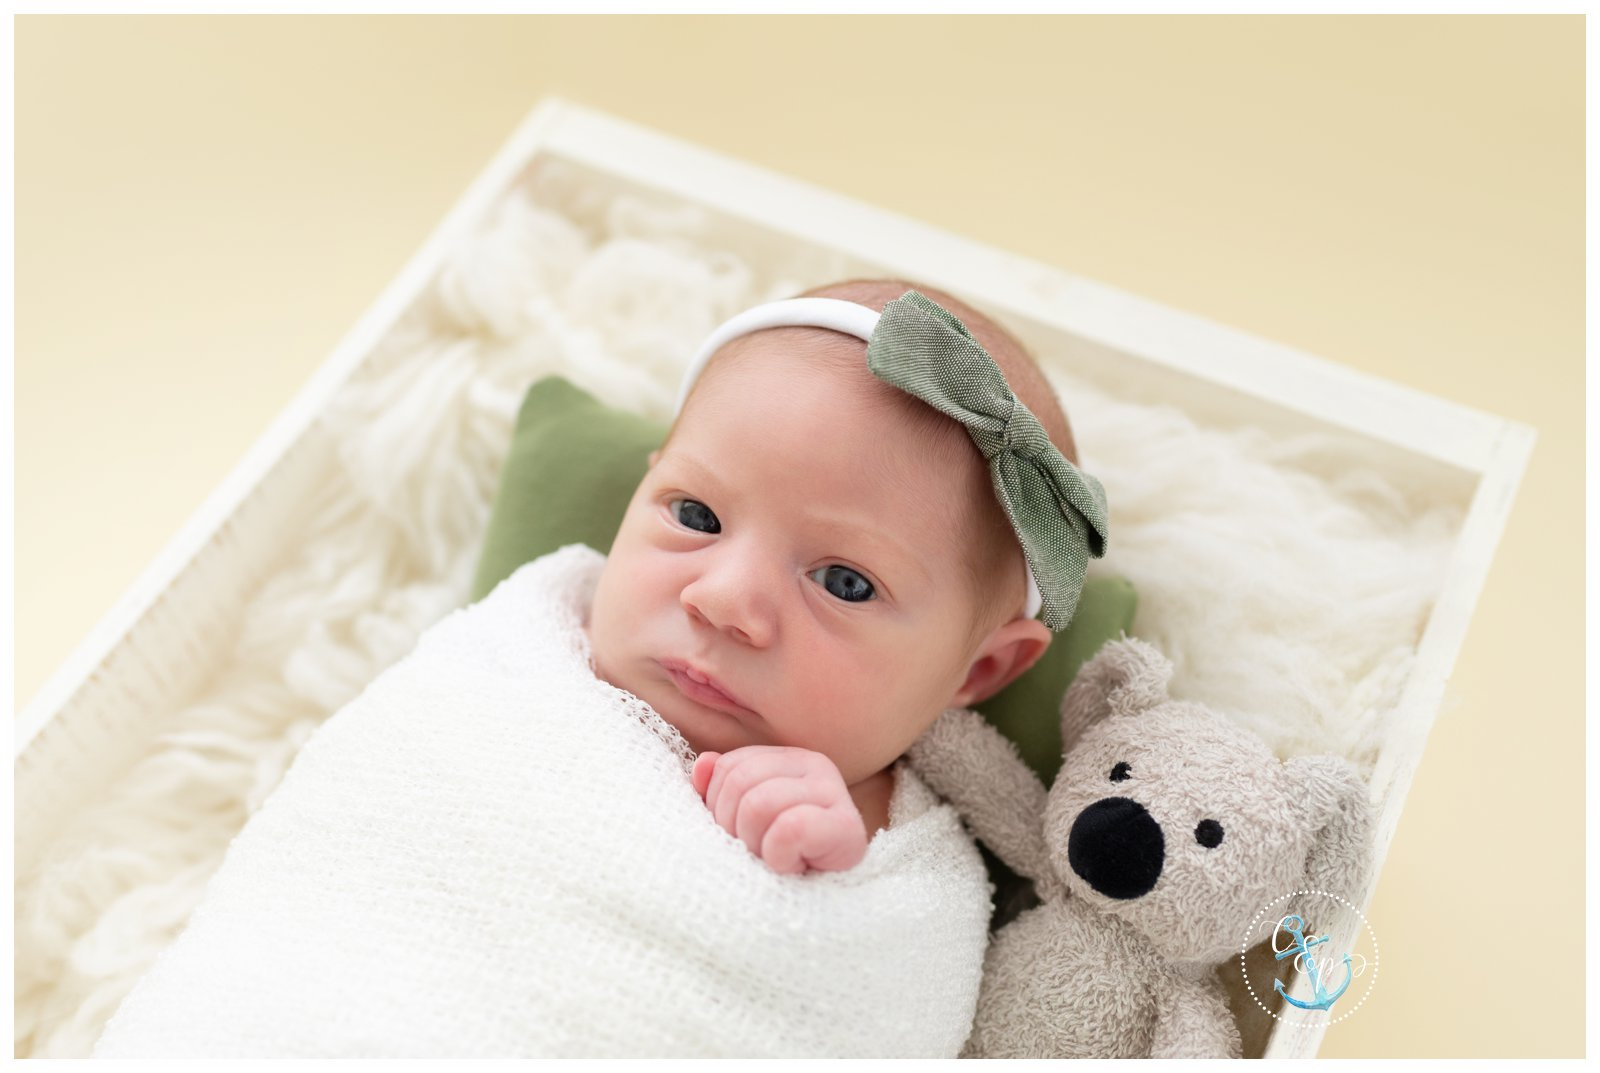 swaddled newborn baby in crate with koala, creamy background, Cristina Elisa Photography Frederick MD